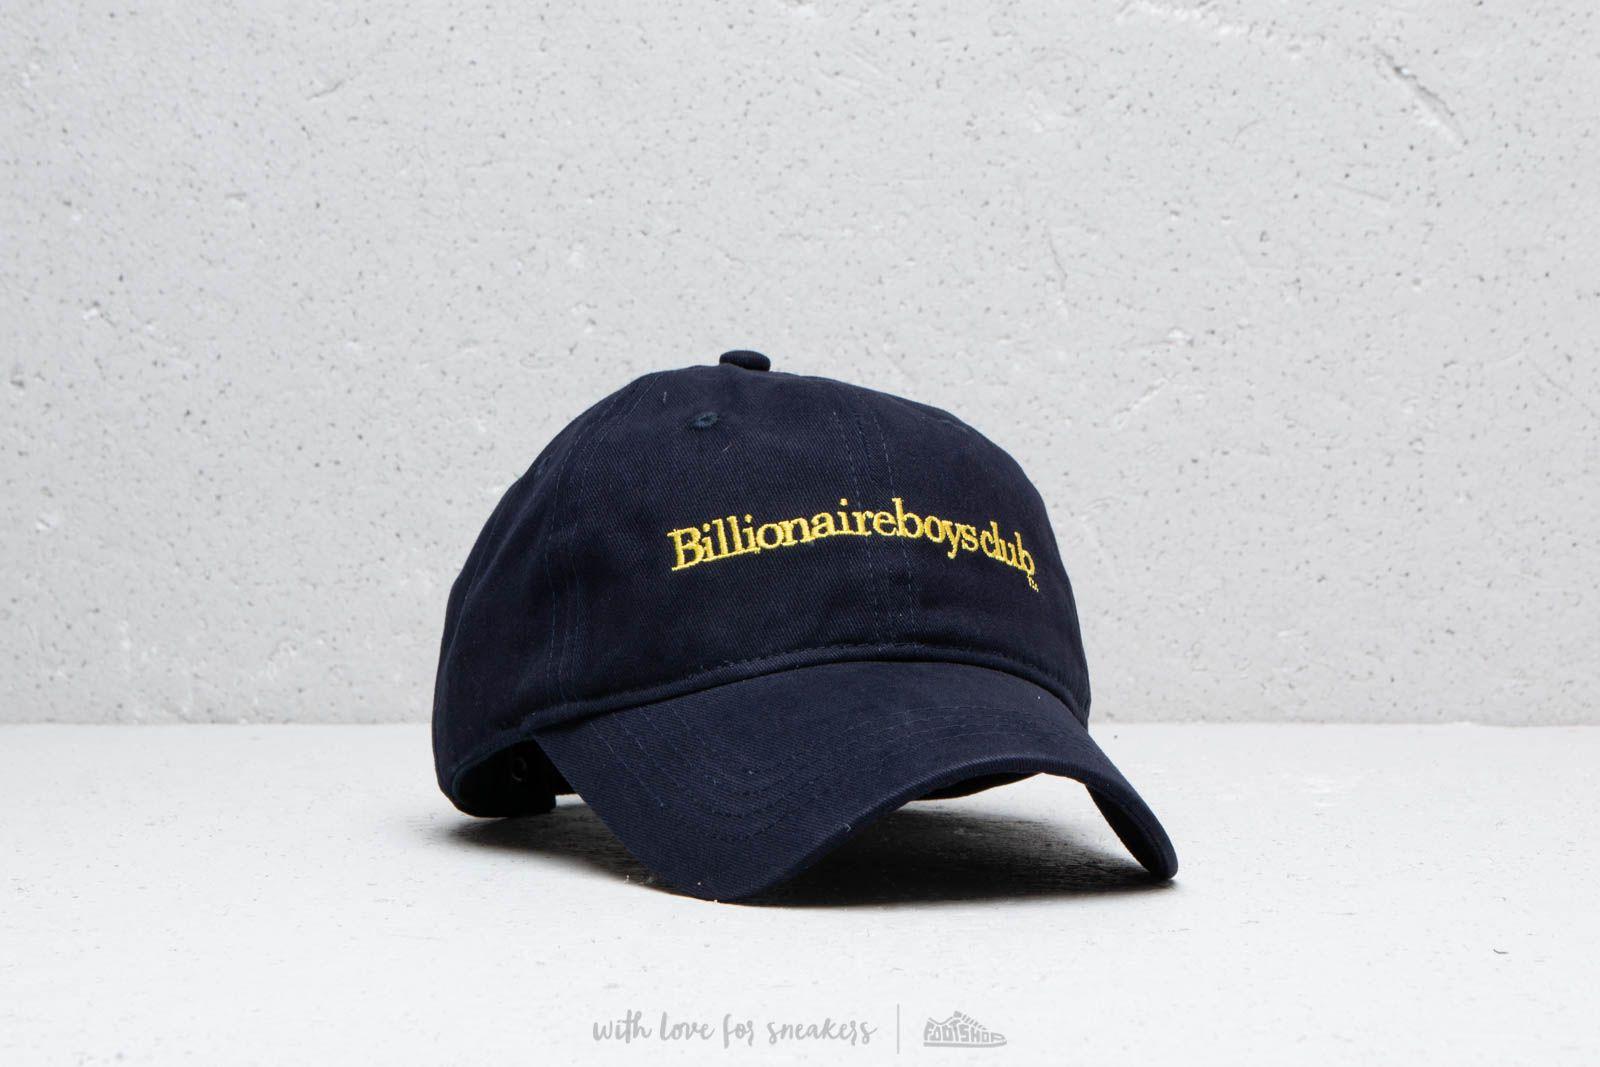 b5faf1134d7 Billionaire Boys Club Embroidered Curved Visor Cap Navy a muy buen precio  71 € comprar en